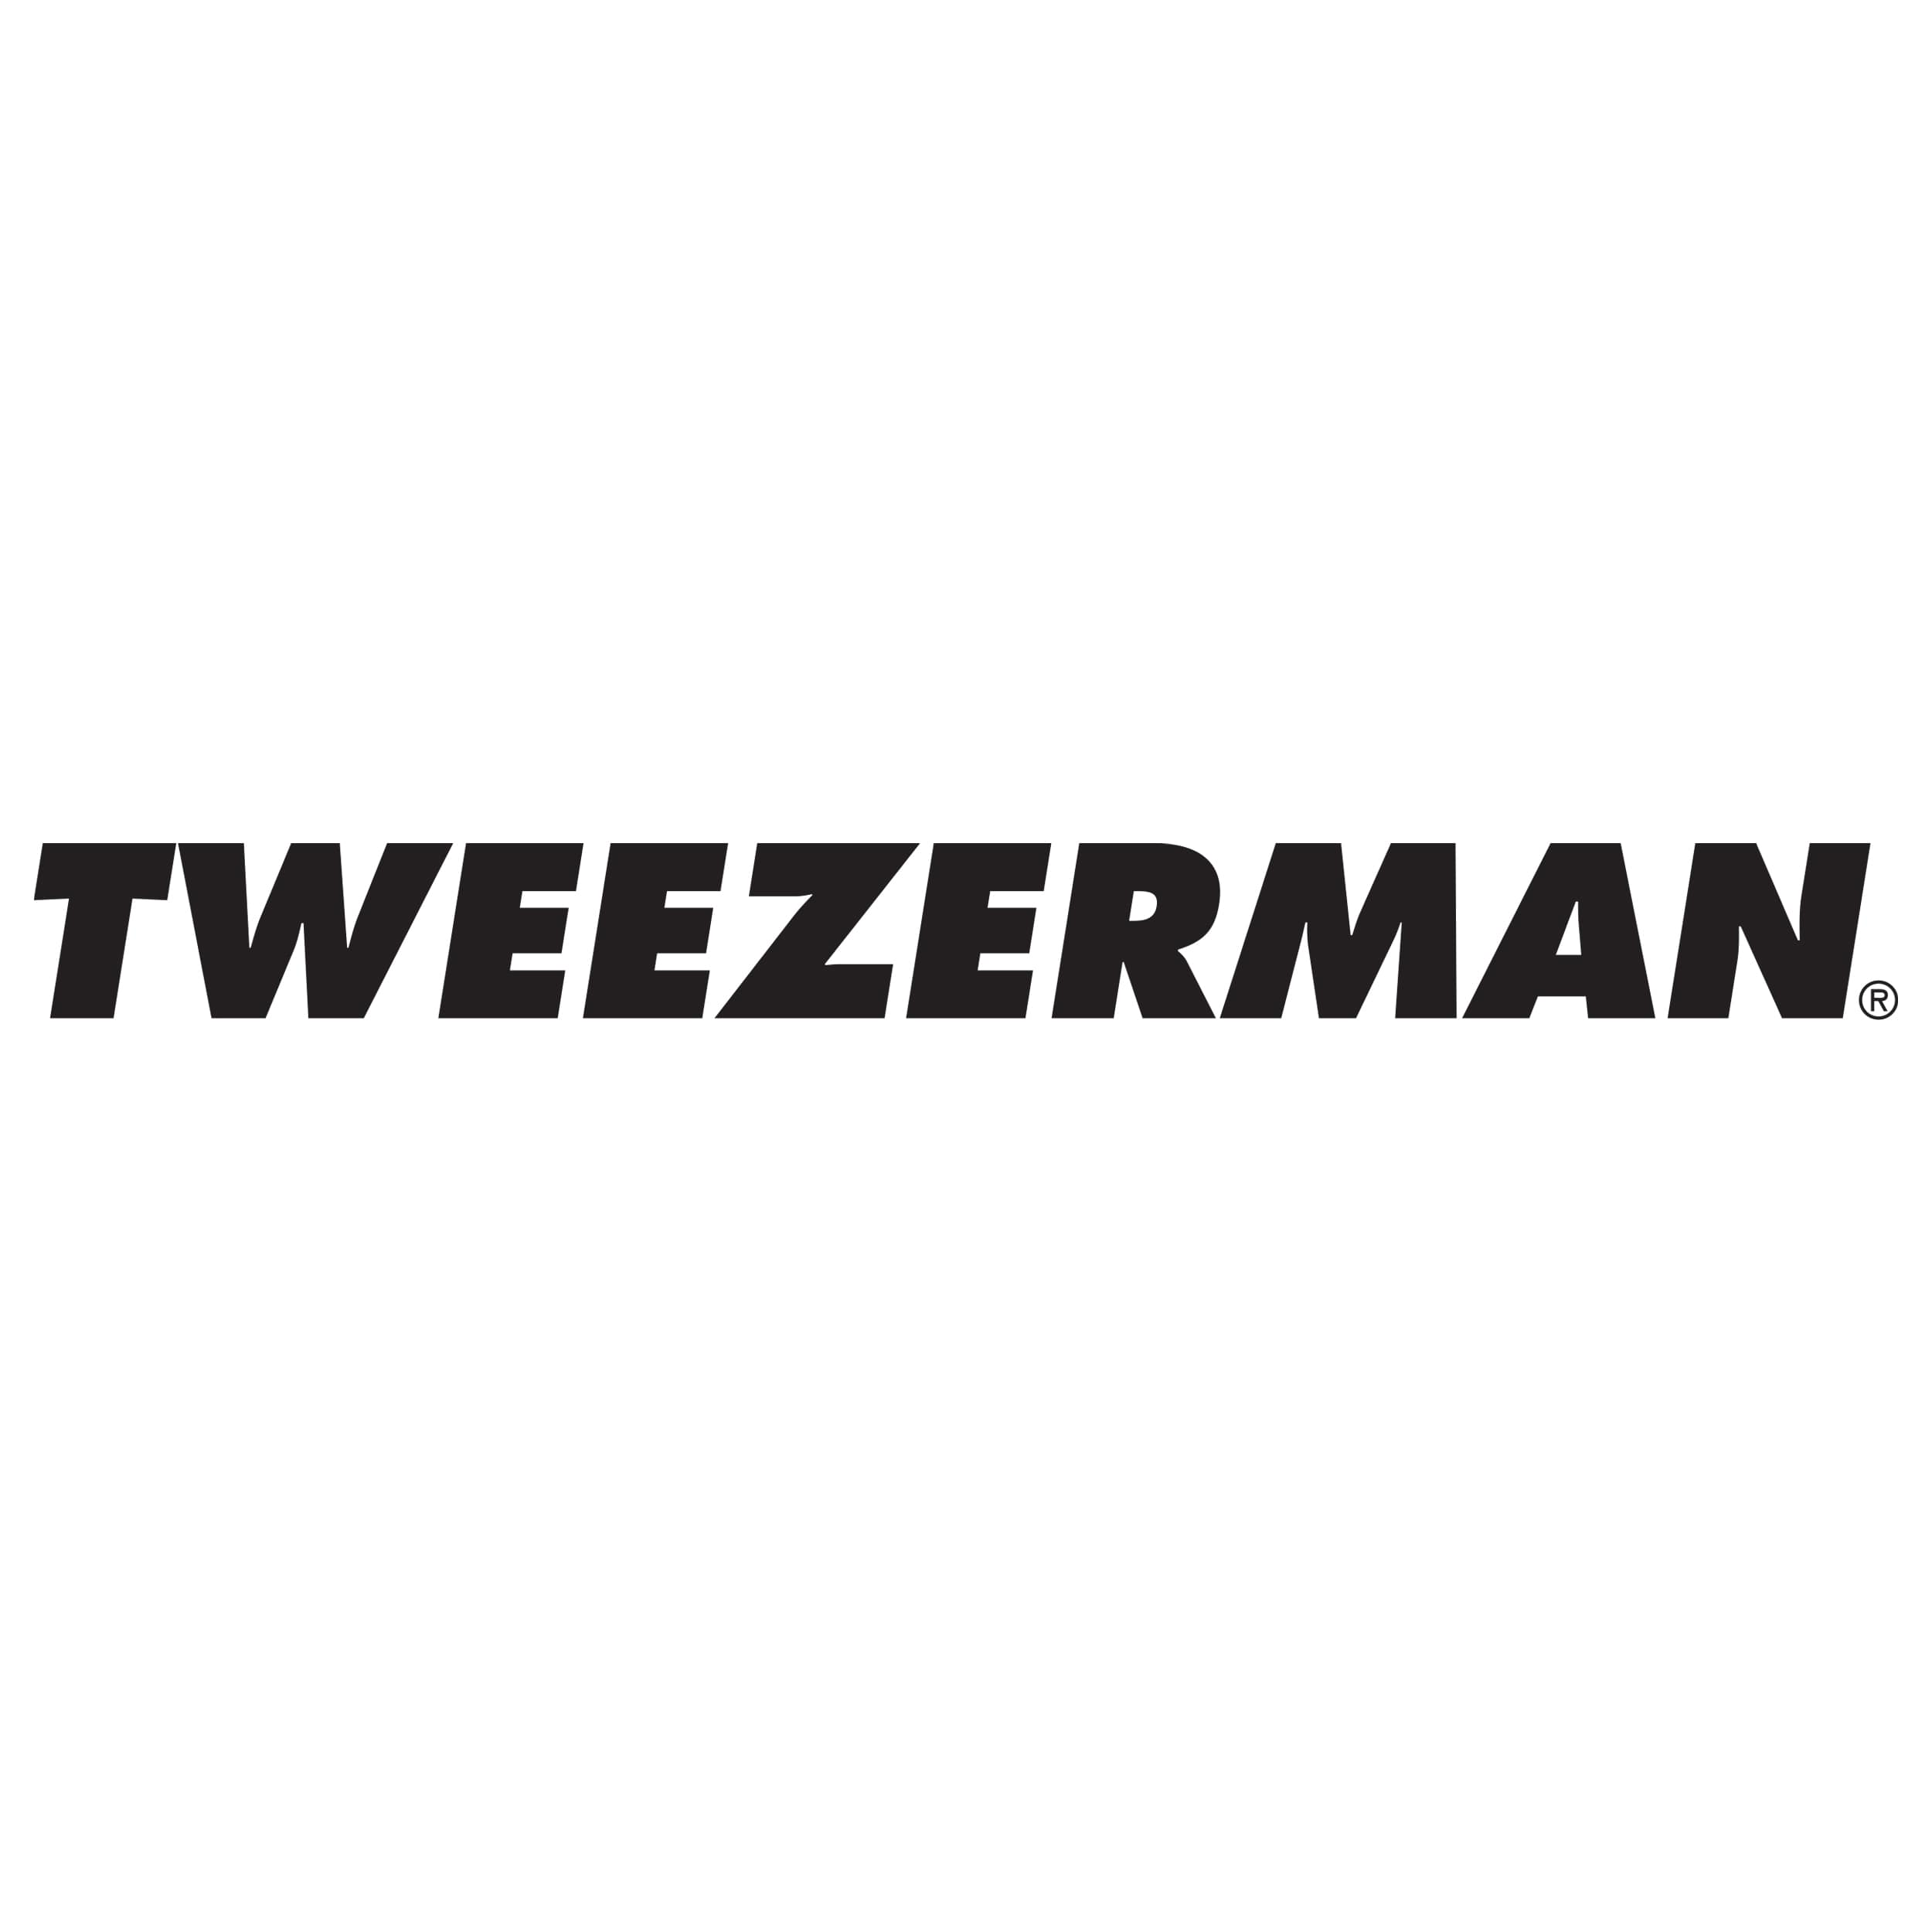 40th Anniversary Mini Tweezer Set with Case